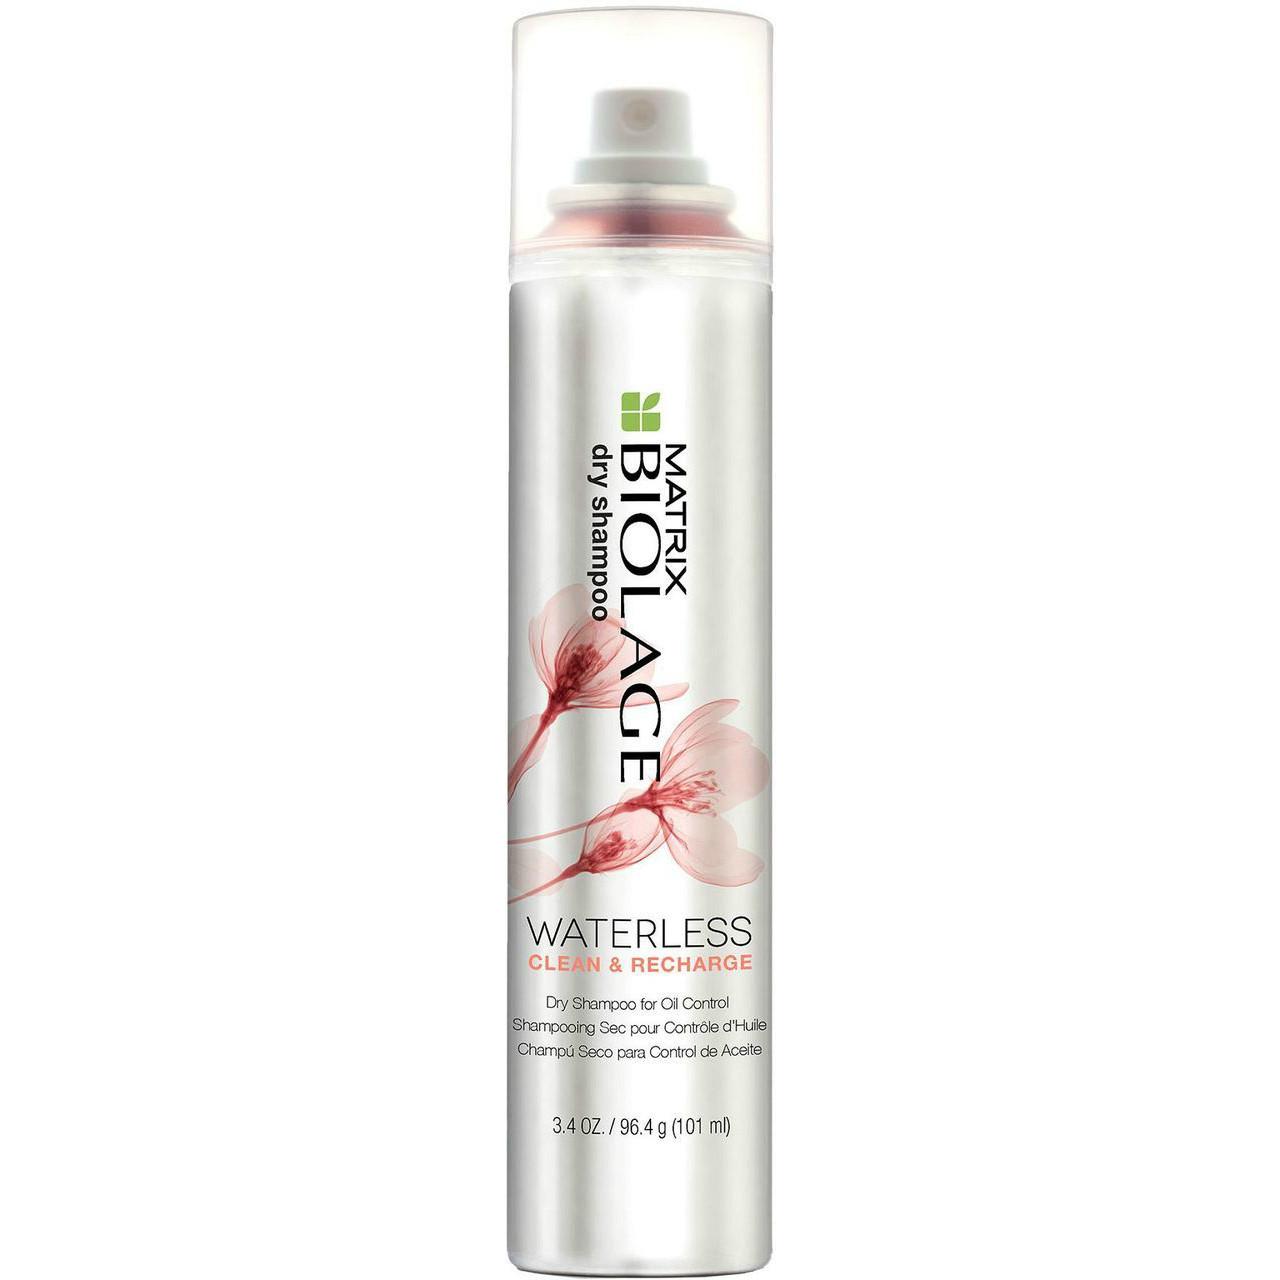 Biolage Waterless Clean & Recharge Dry Shampoo 3.4 Oz